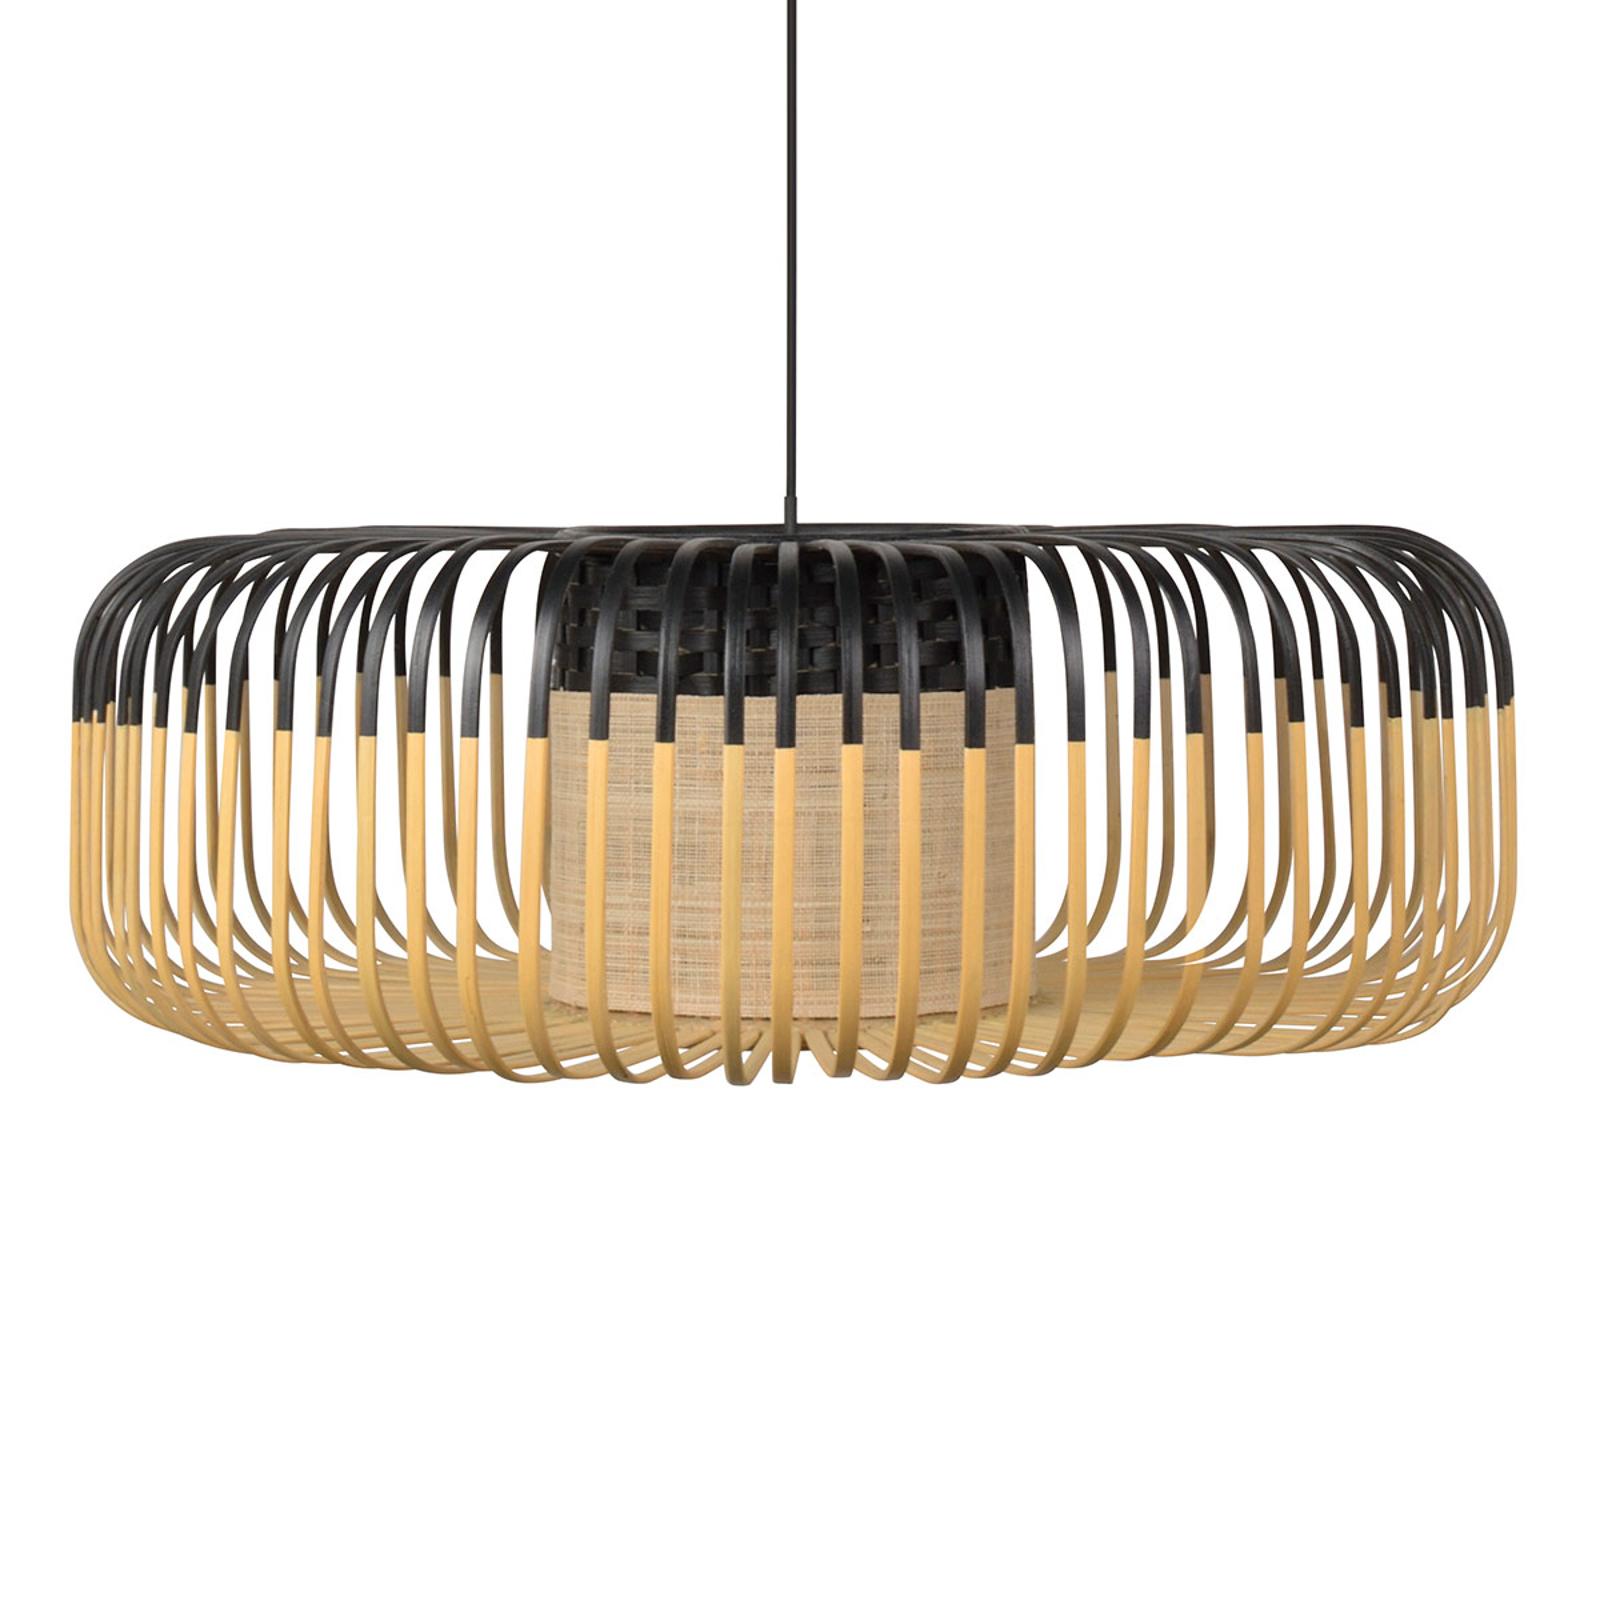 Forestier Bamboo Light XL lampa wisząca czarna